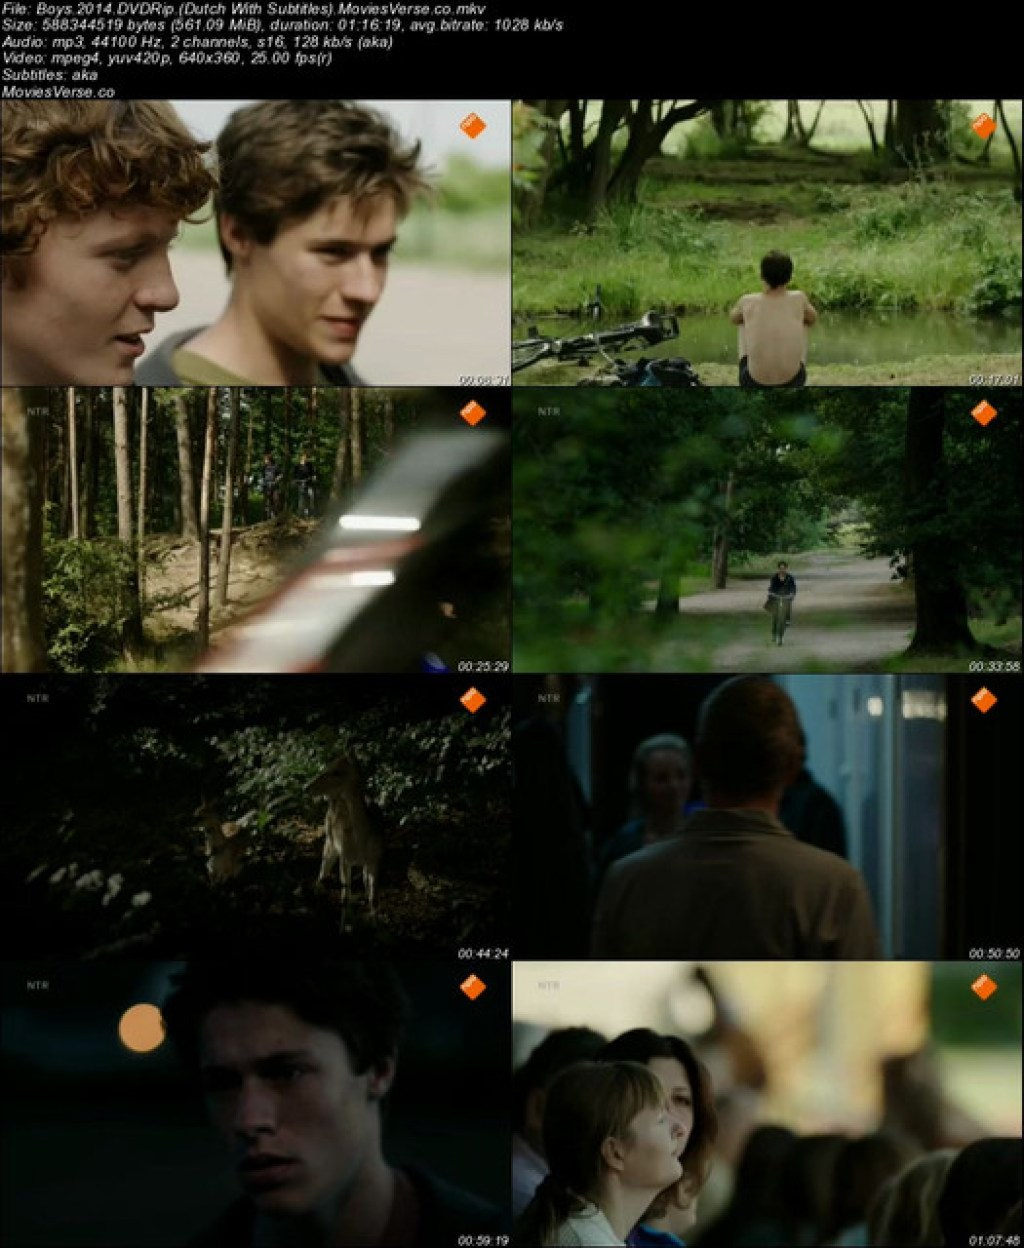 Boys-2014-DVDRip-Dutch-With-Subtitles-Movies-Verse-co